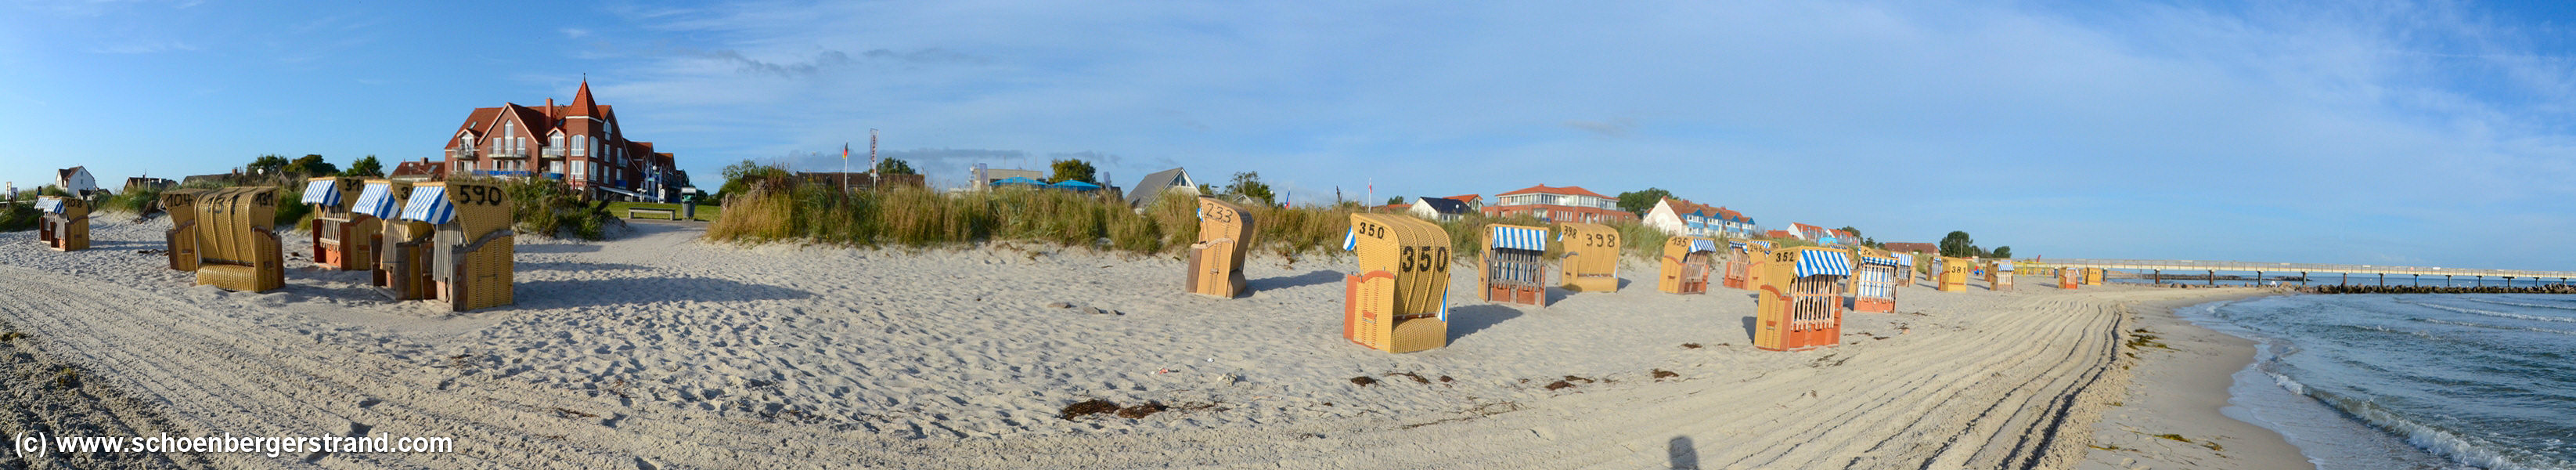 Schönberger Strand Morgens im September